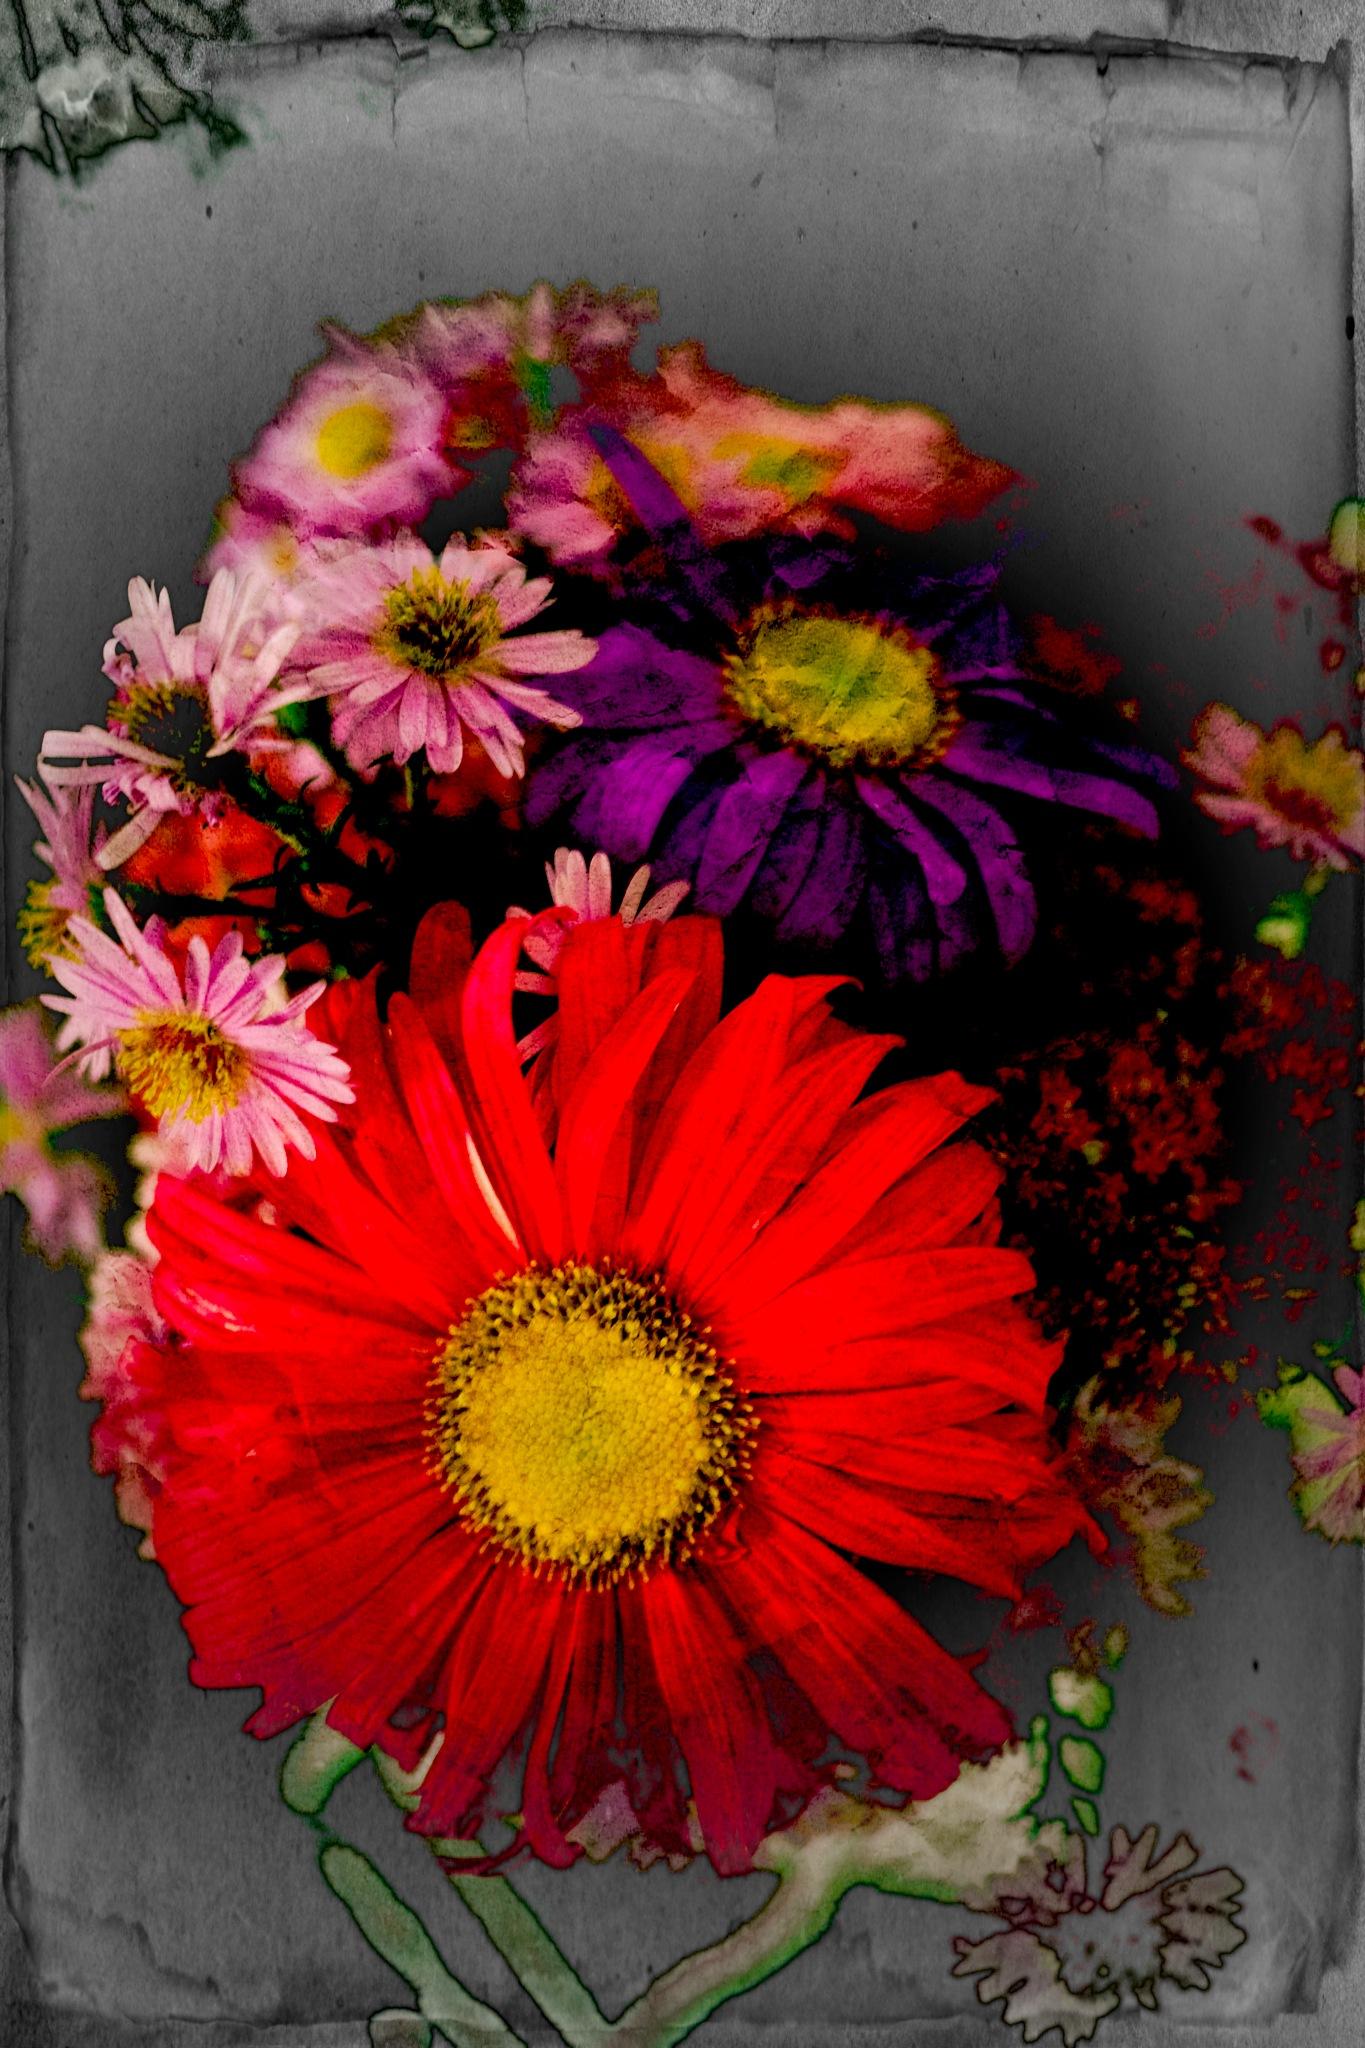 Sunday´s Colors , 25.9.16 by Goran Jorganovich